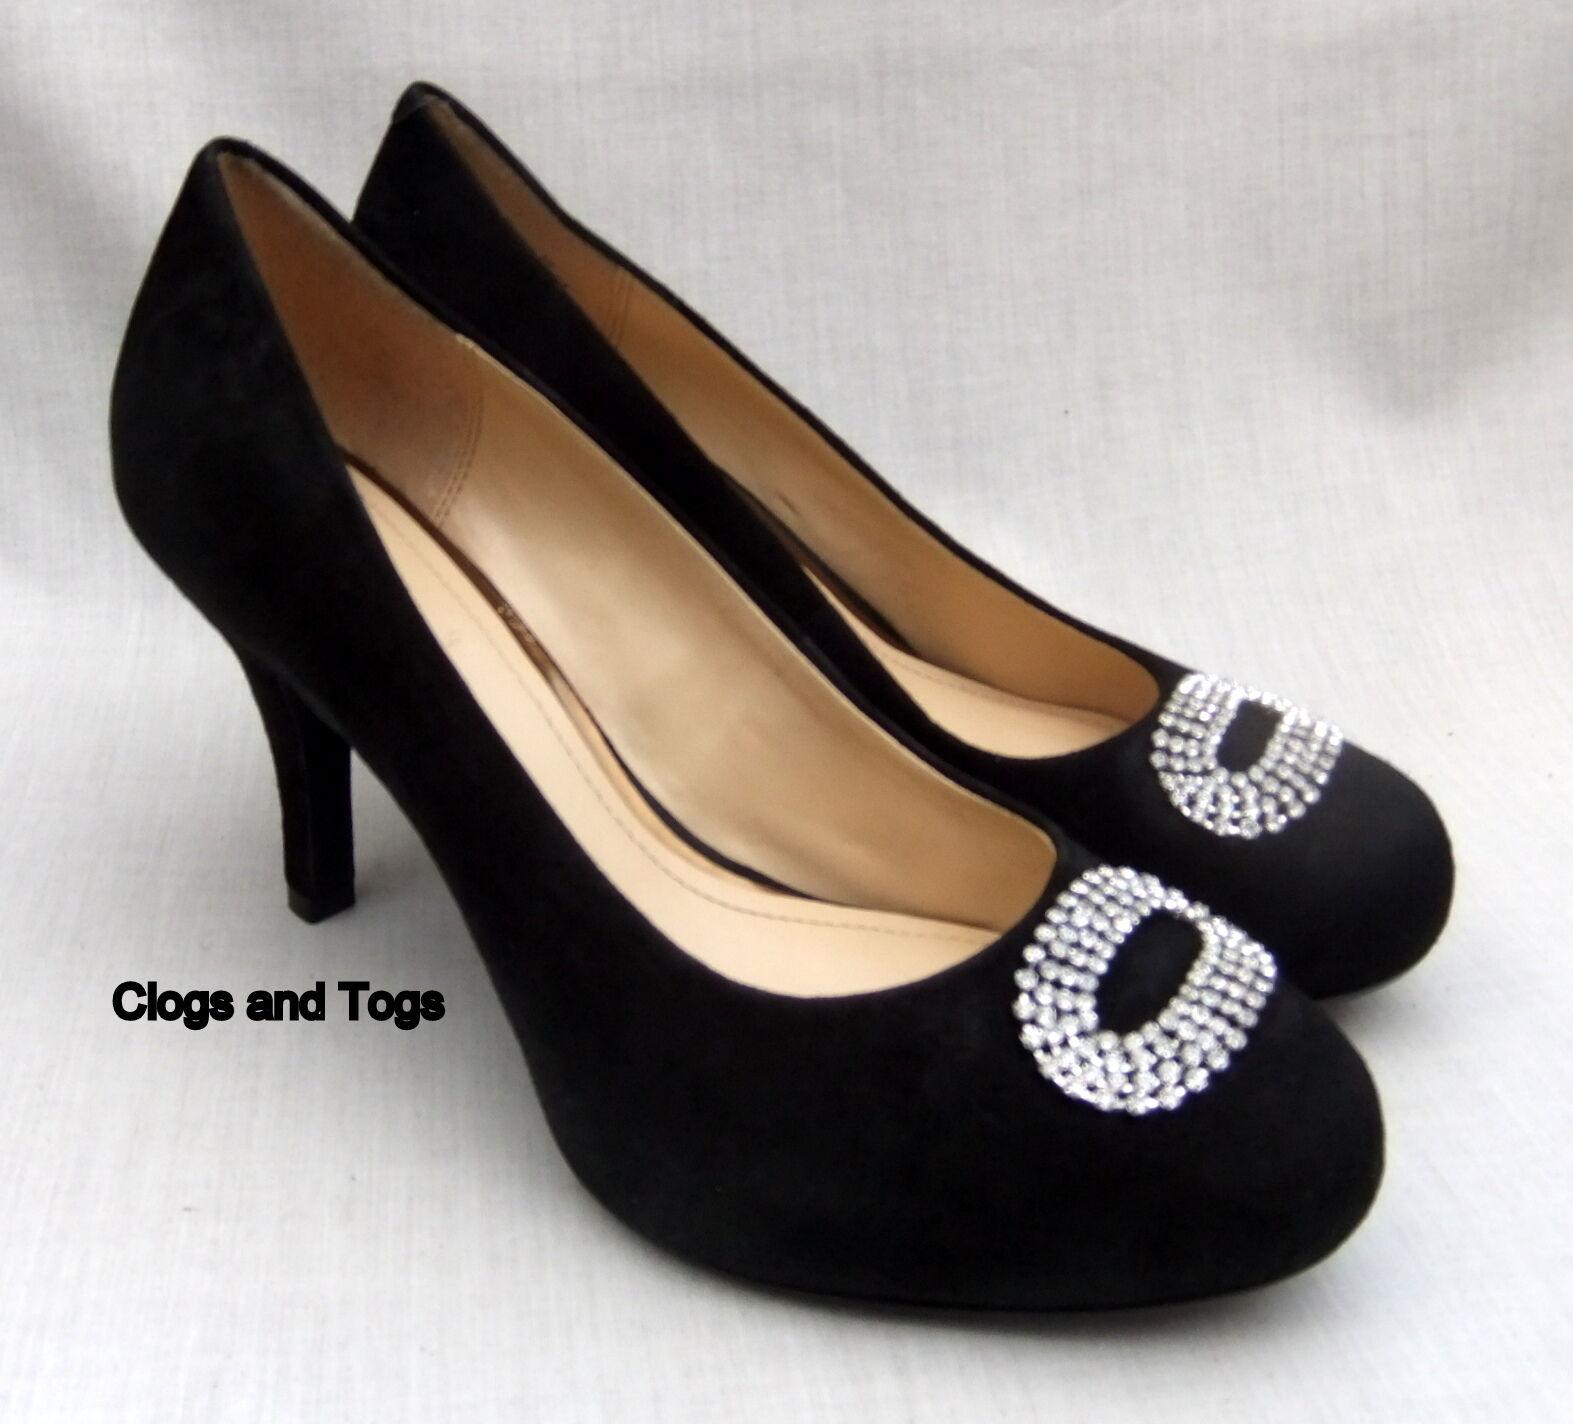 NEU CLARKS DRUM ROLL Damenschuhe BLACK SUEDE DIAMANTE HIDDEN PLATFORM Schuhe 7 / 41